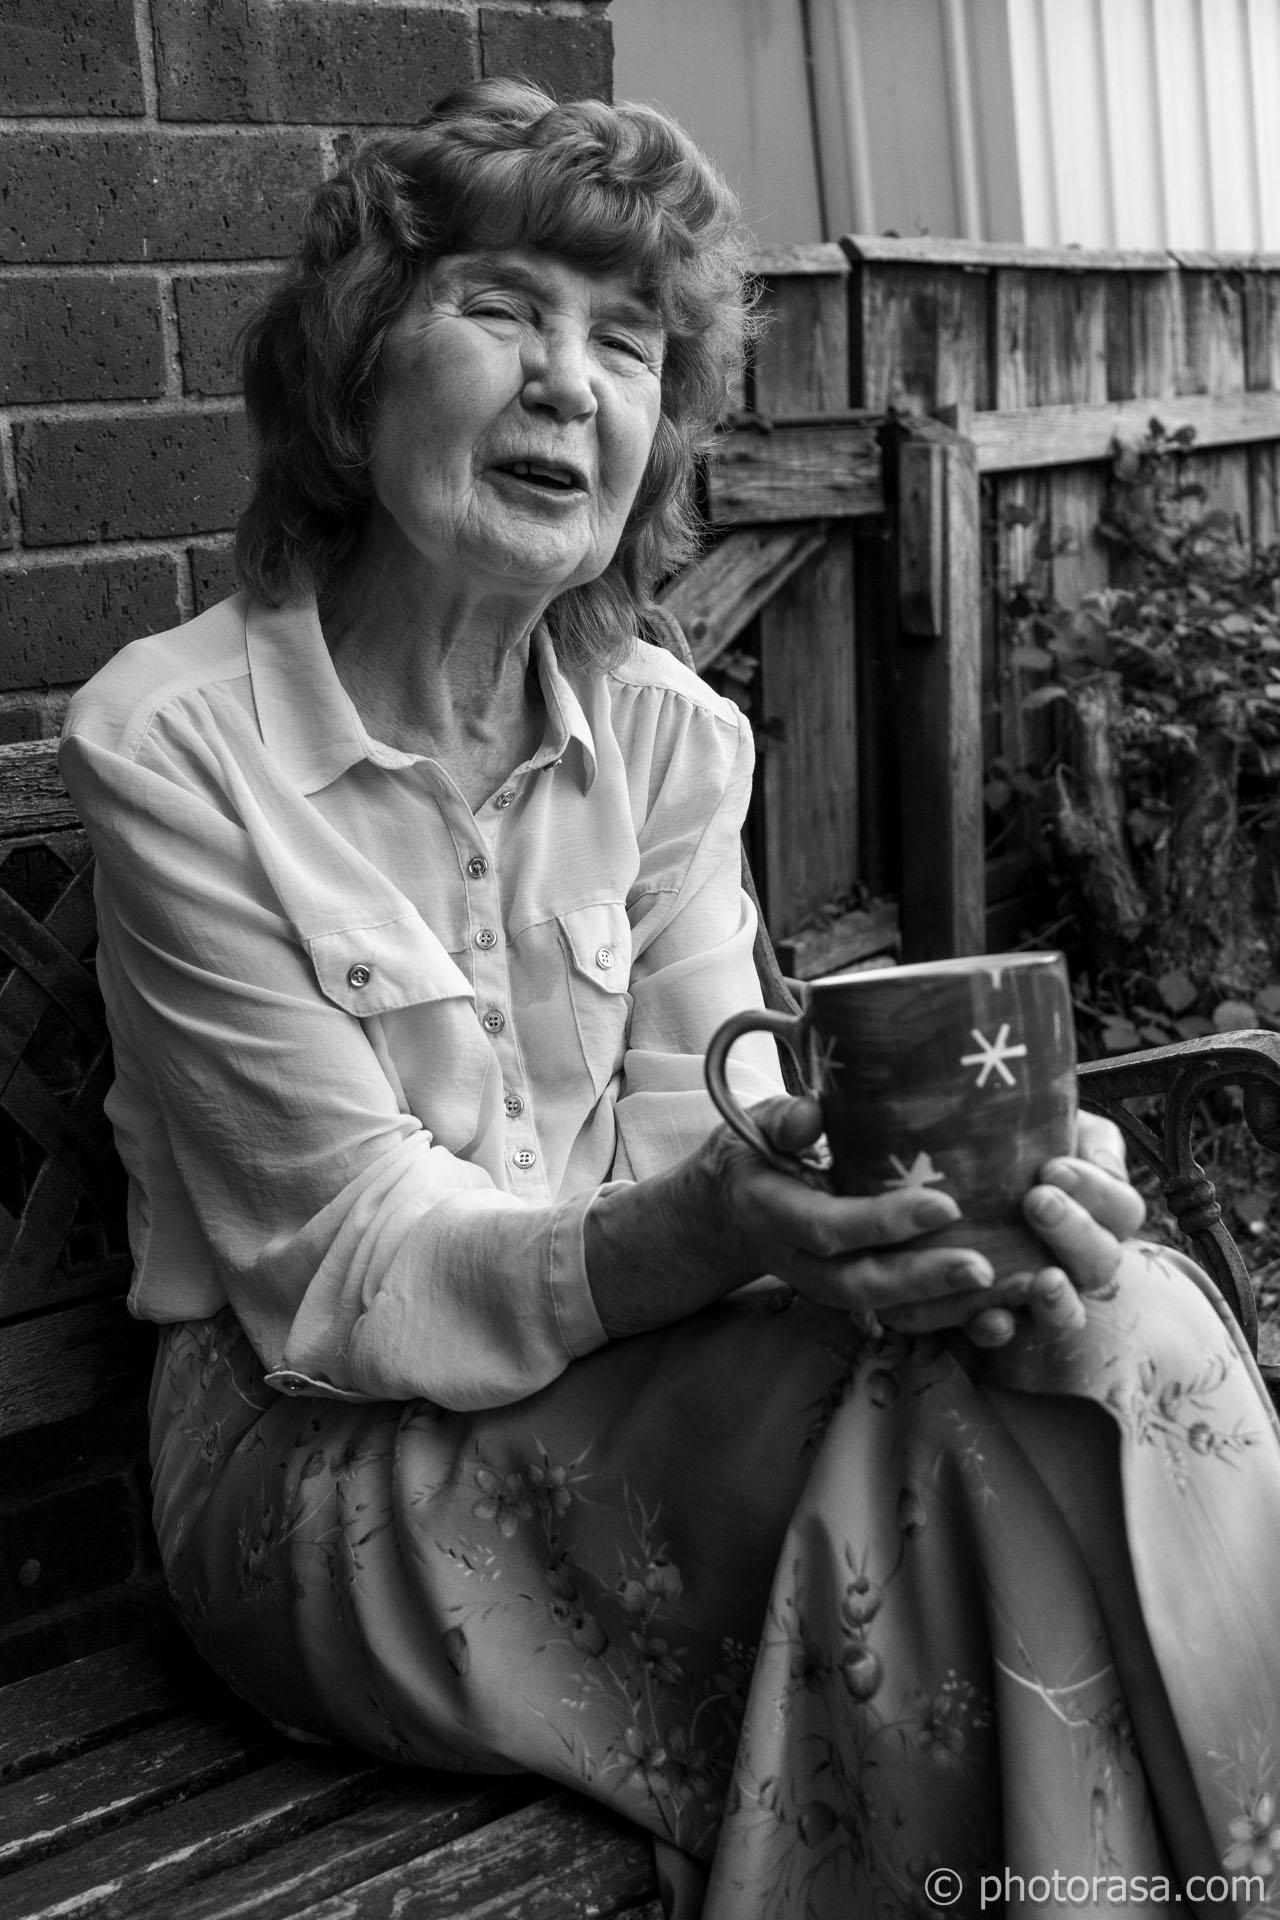 https://photorasa.com/joan/talking-with-a-cup-of-tea/